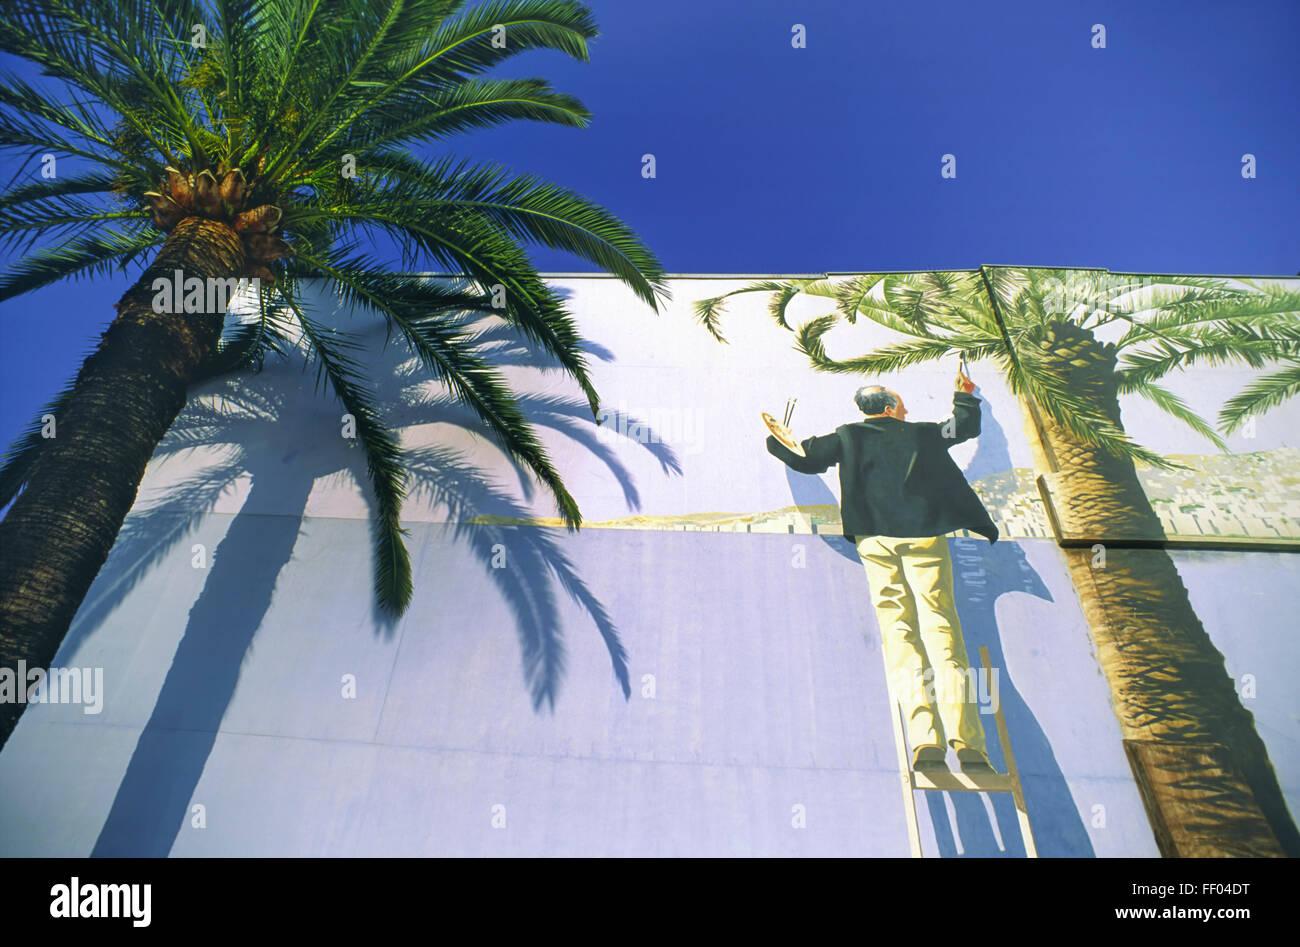 Frankreich, Nizza, Wandmalerei, palm-Baum, blauer Himmel Stockbild